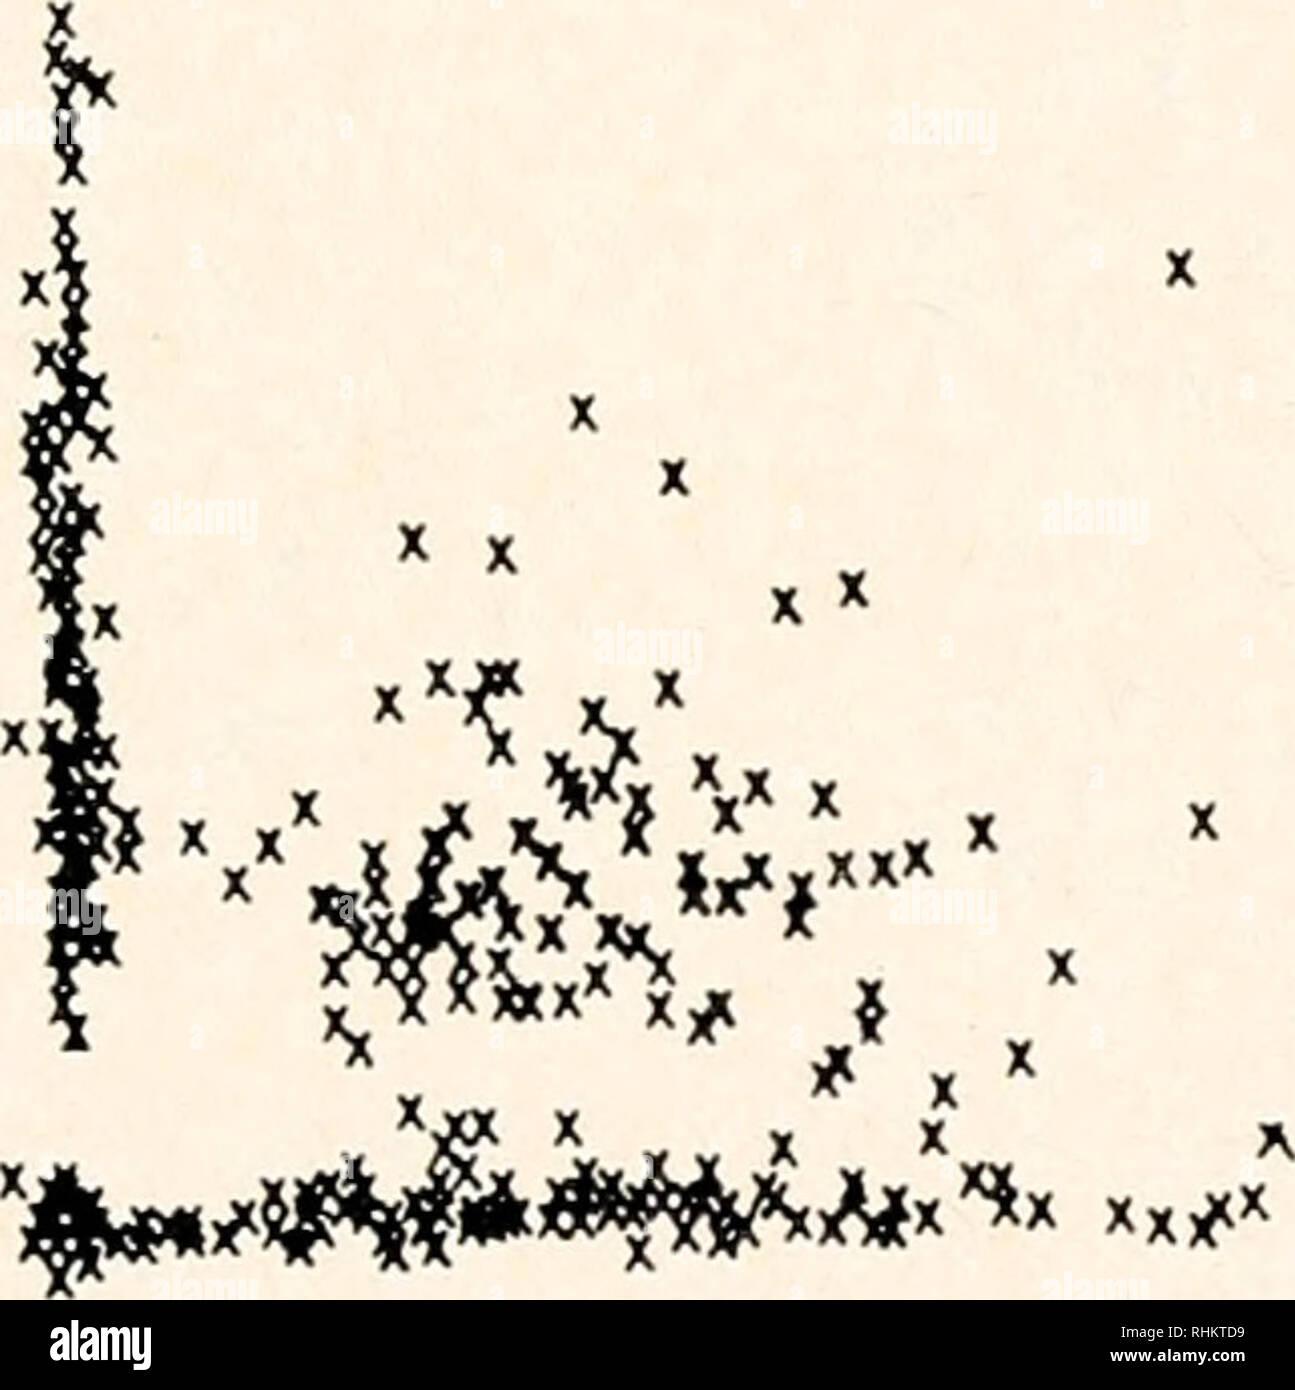 Ld-Singles online datieren Mit milder Zerebralparese